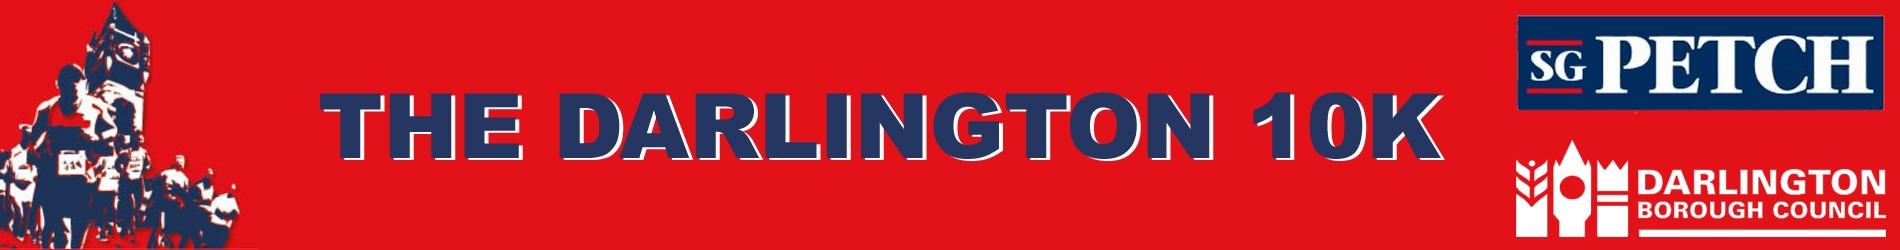 The SG Petch Darlington 10K 2021